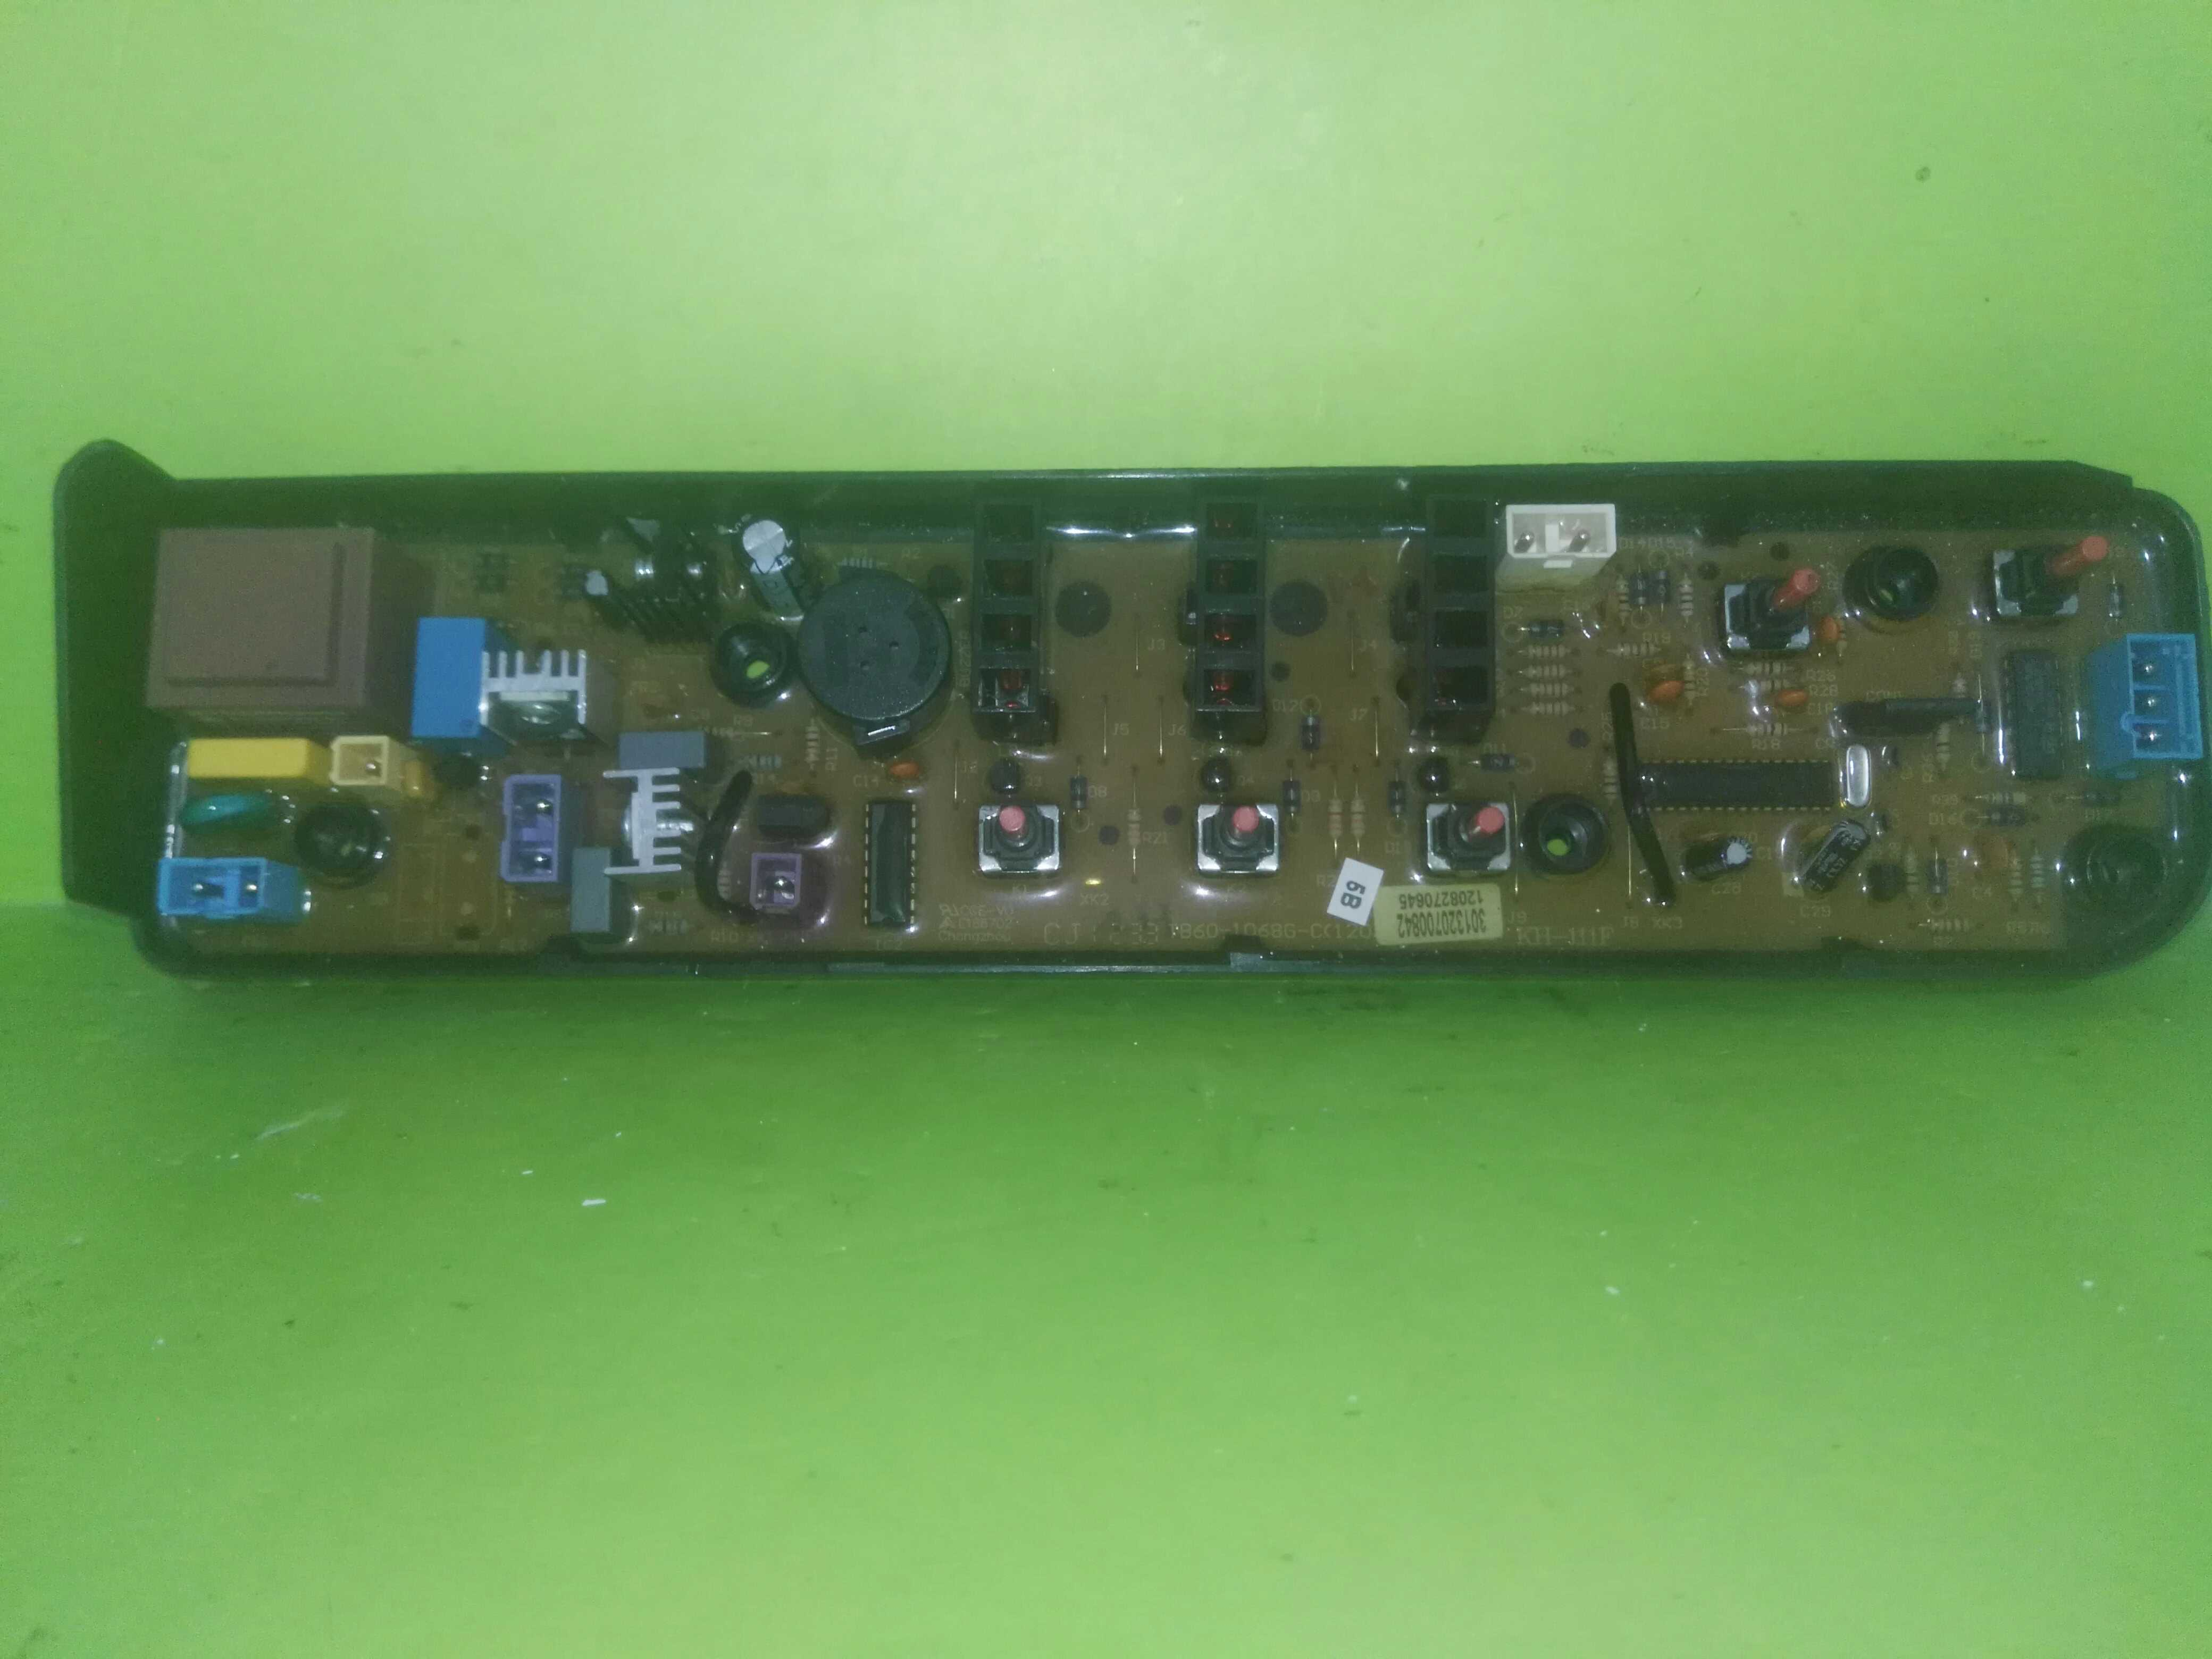 KH-111F小天鹅全自动洗衣机主板TB60/70-1068G-C MB55/MB53-3006G,可领取元淘宝优惠券